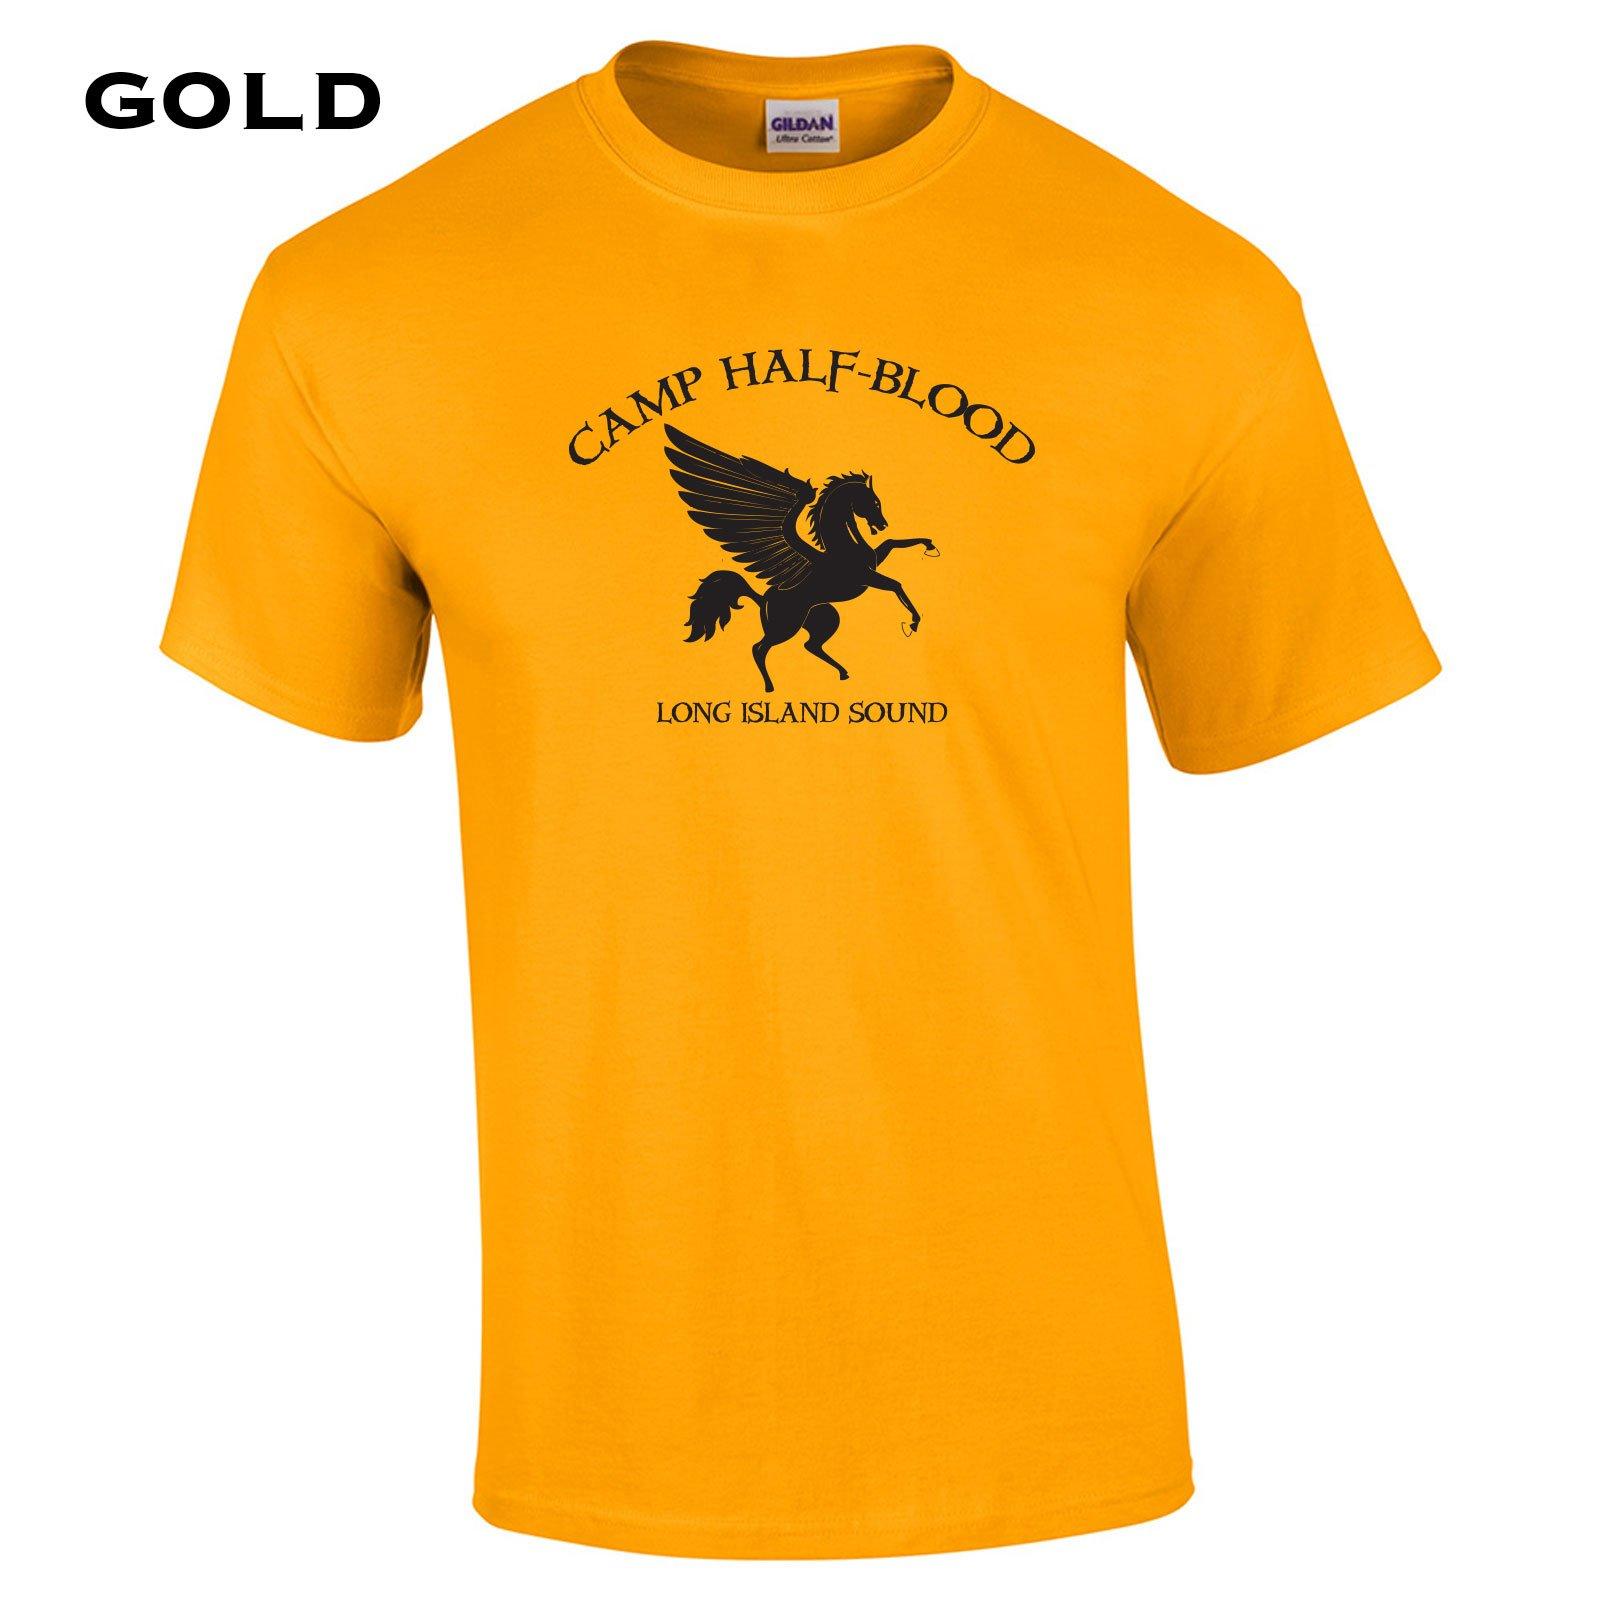 138 Camp Half Blood Funny S T Shirt